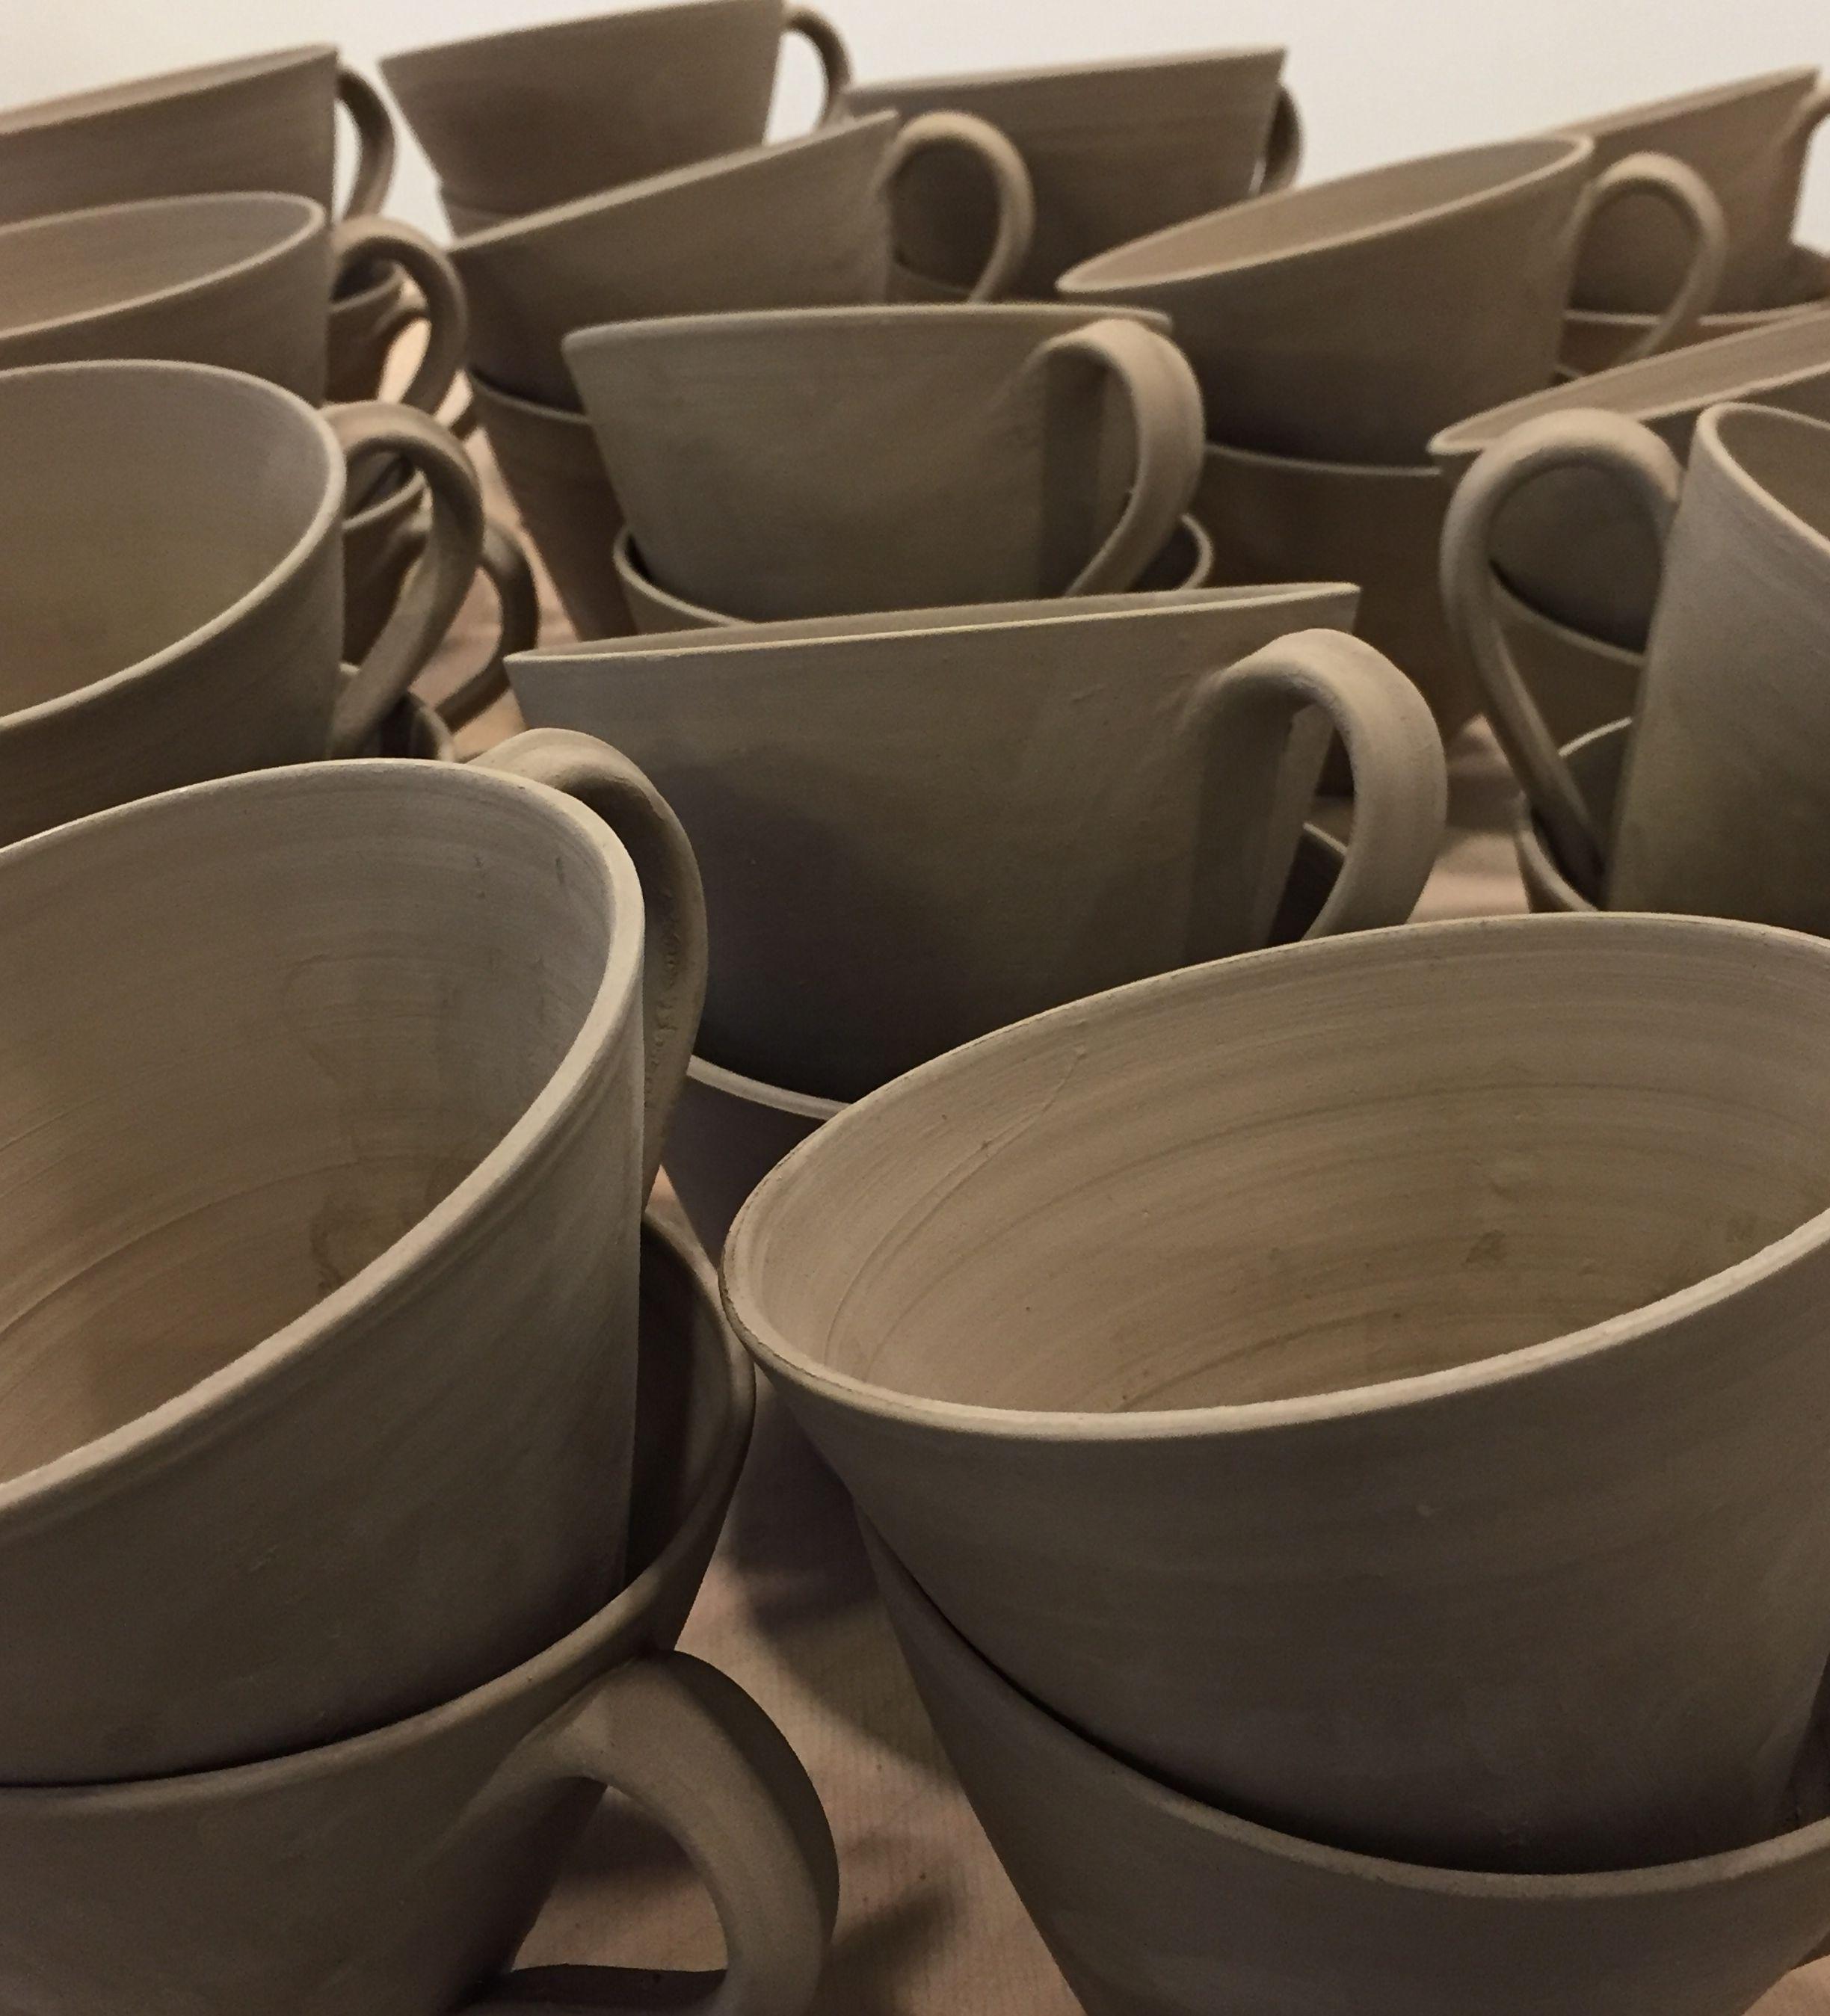 koppar av keramik